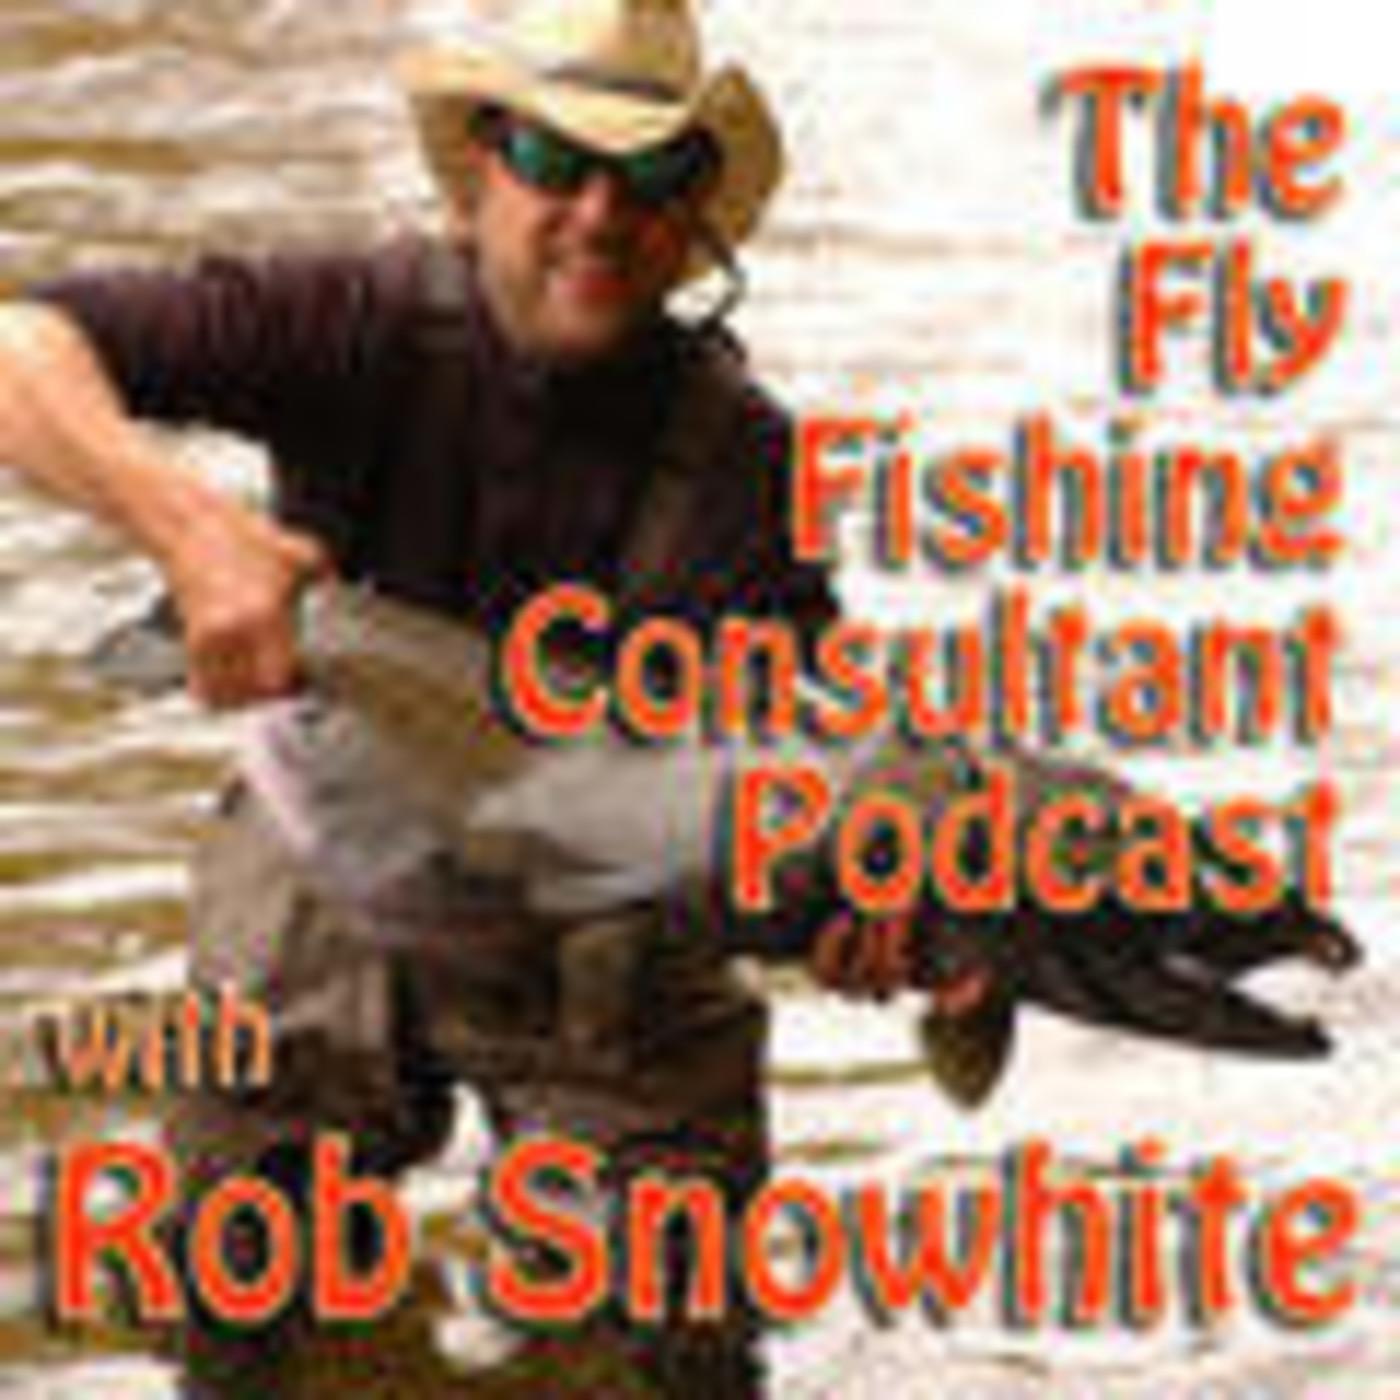 Rob Snowhite